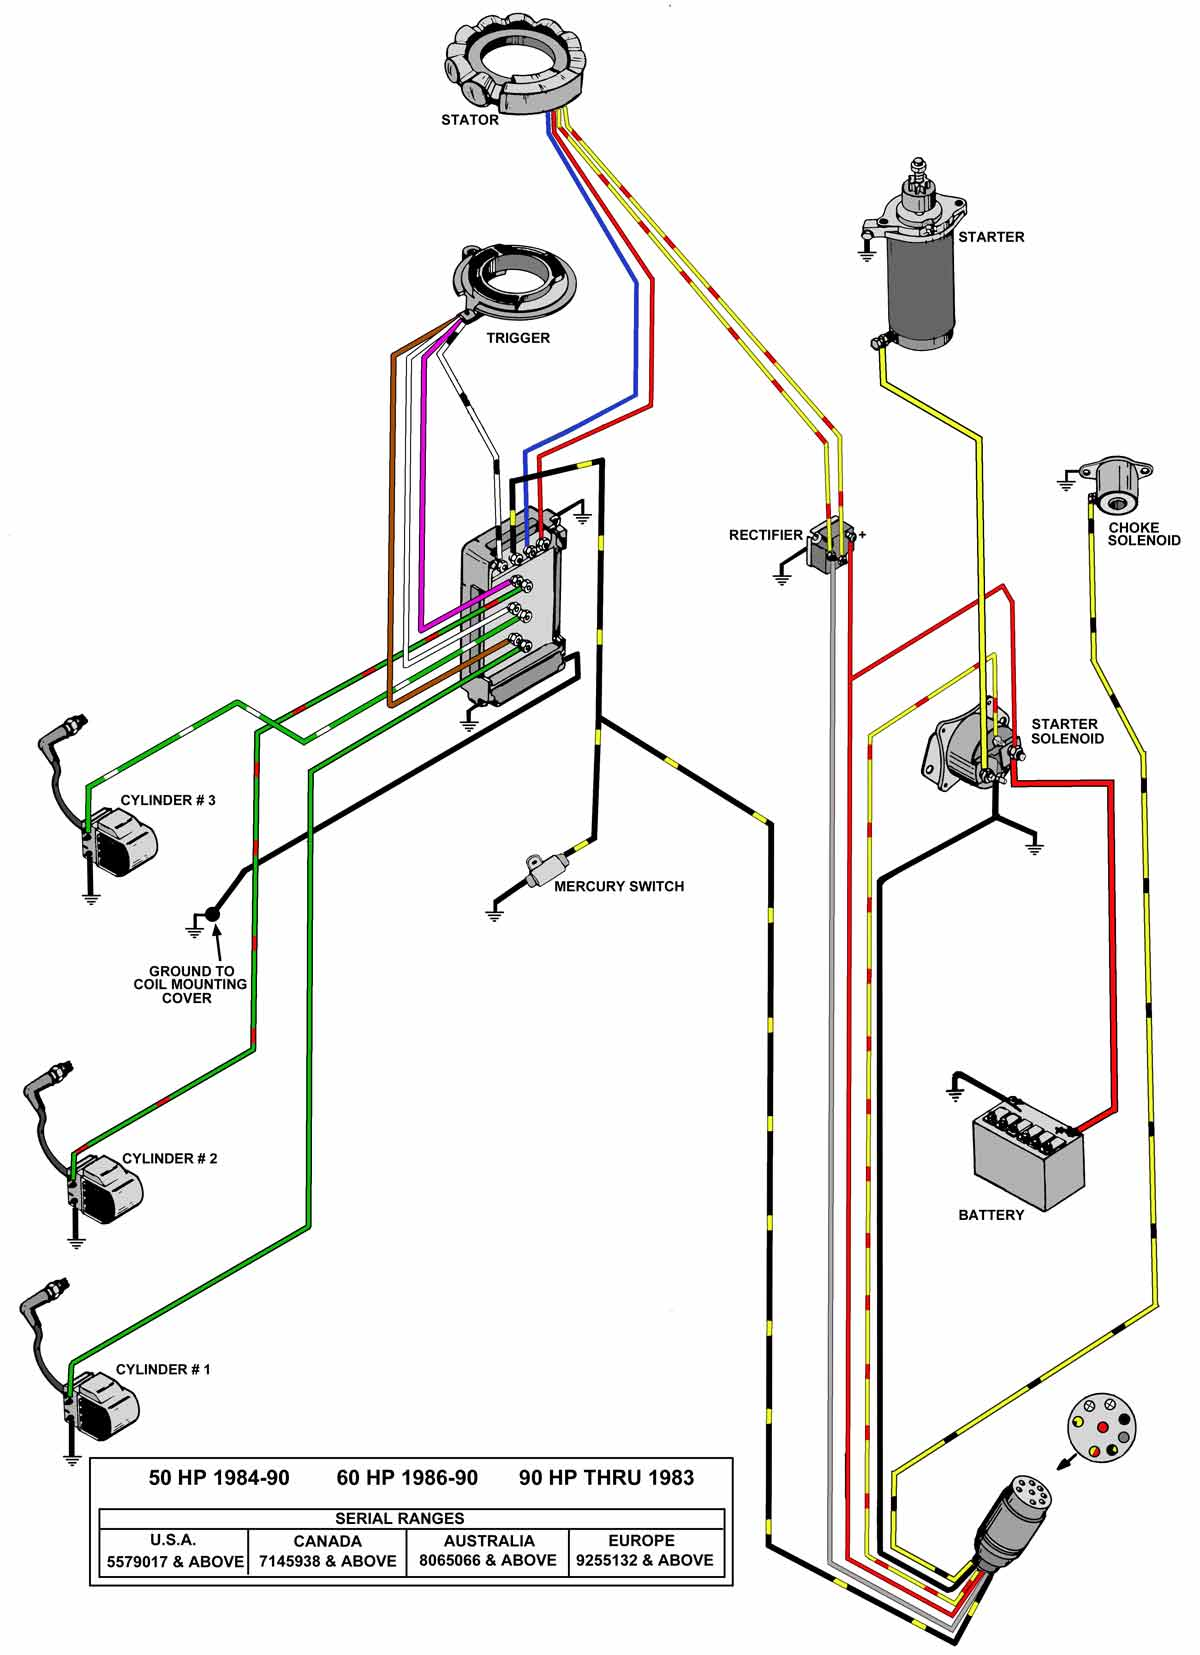 0d231204 mercury outboard wiring diagram wiring schematic diagram0d231204 mercury outboard wiring diagram tv igesetze de \\u2022 mercury 110 9 8 outboard diagram 1999